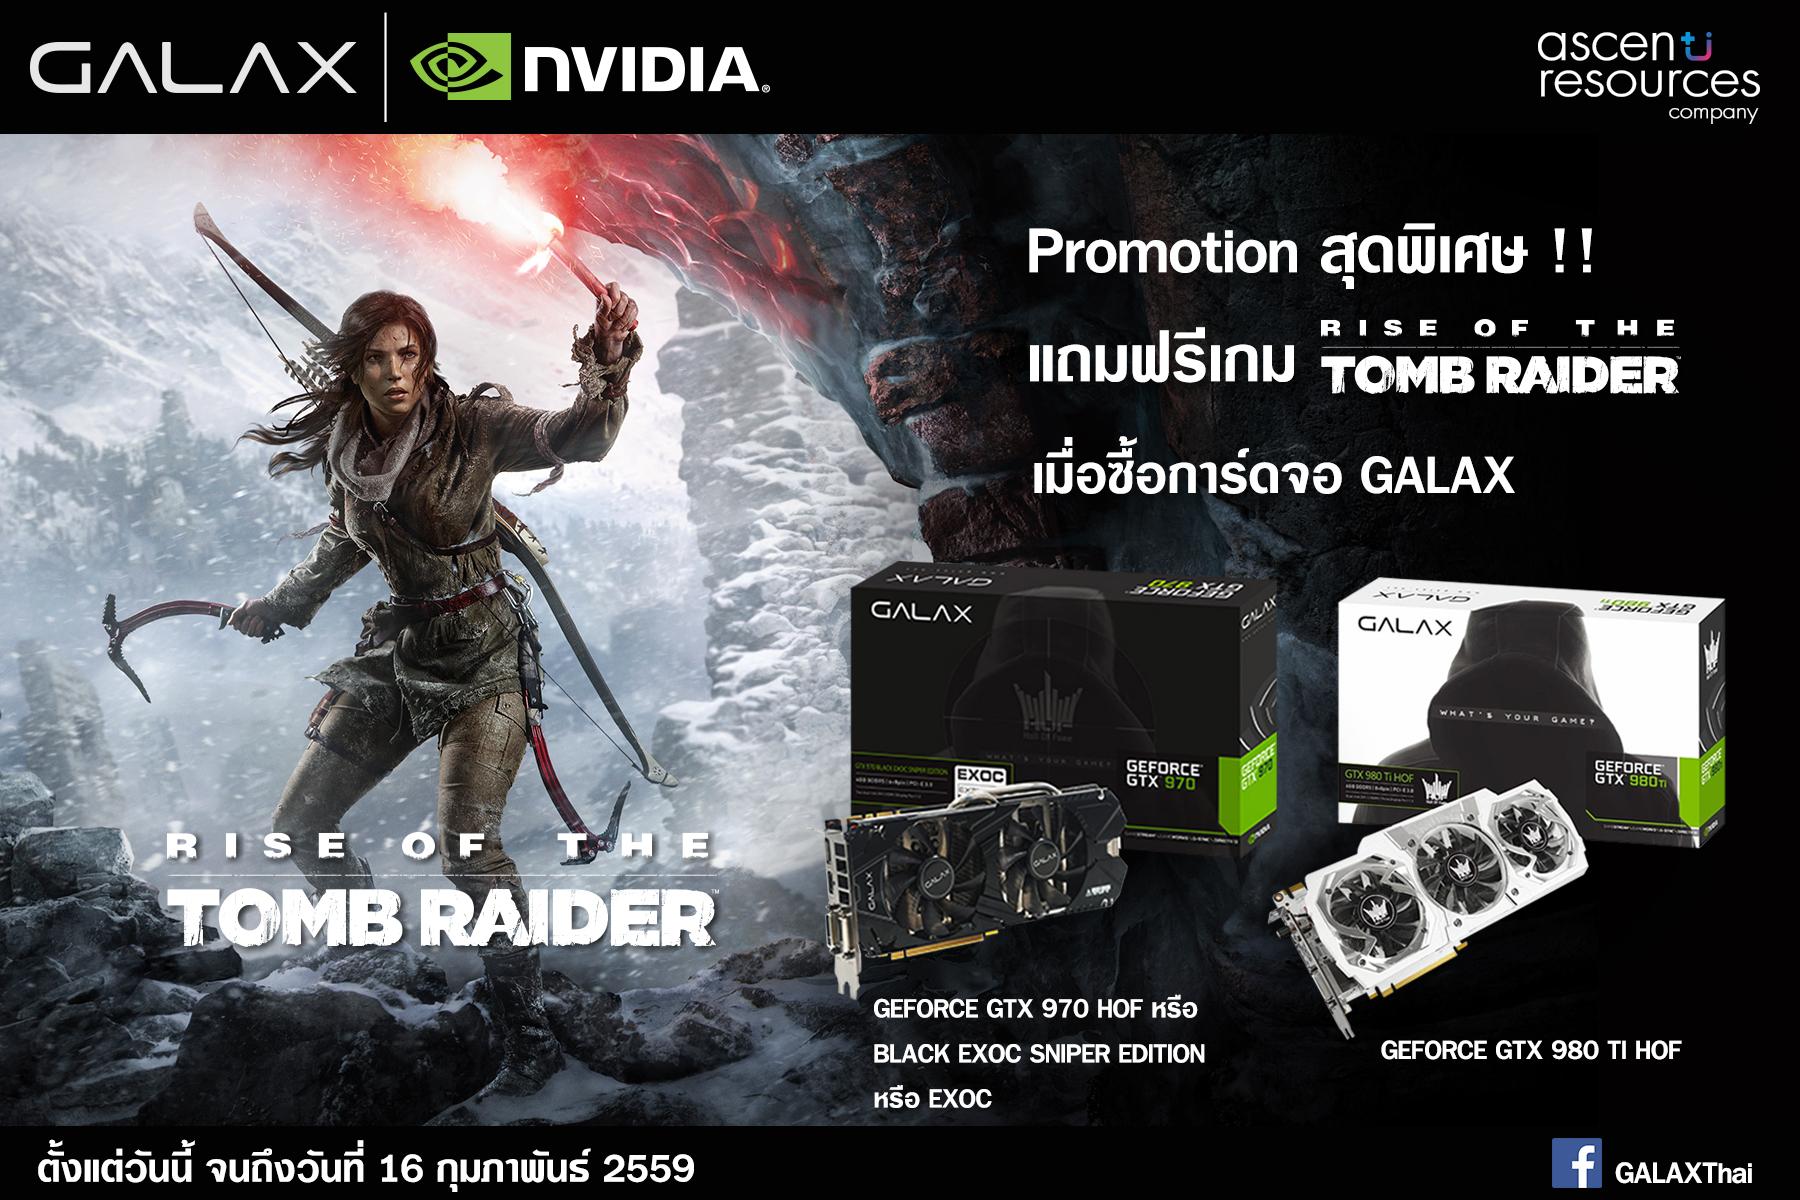 PR Galax Promote Tomb Raider